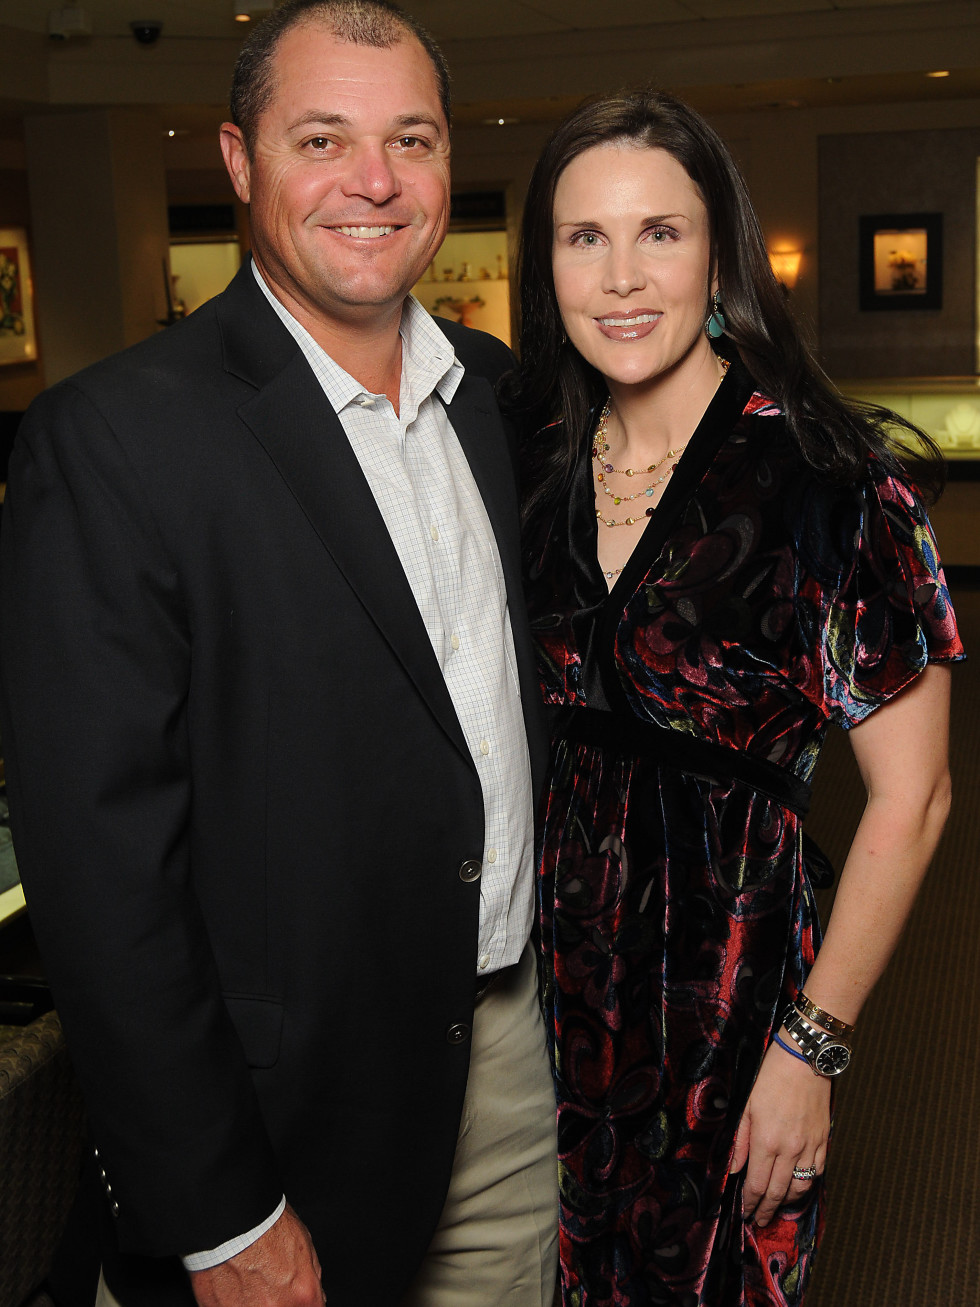 Houston, Project 88 kick-off party, October 2015, Jeff and Kathleen Zinn